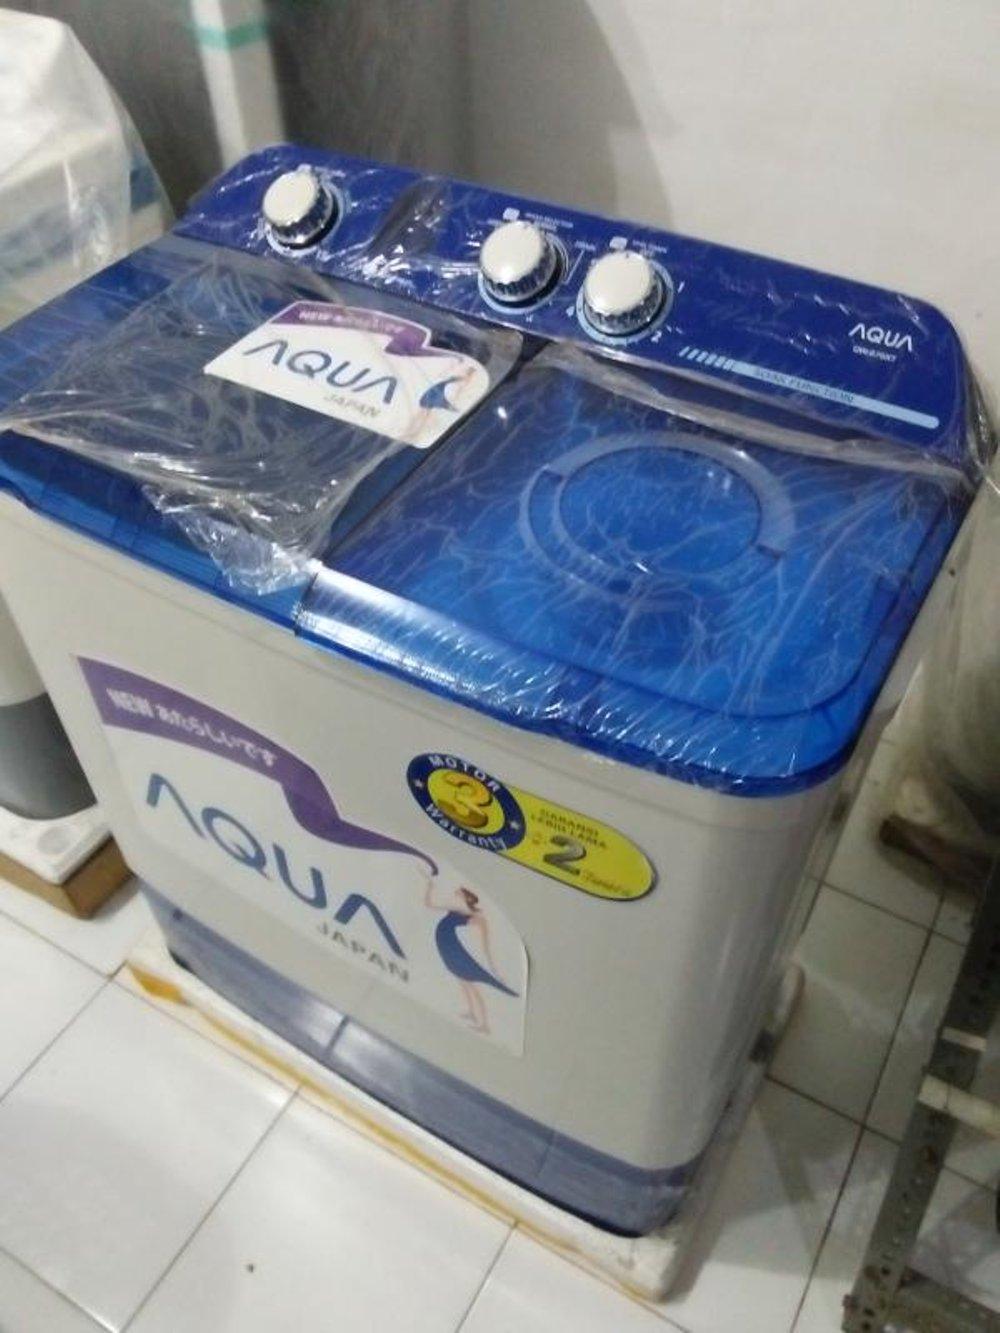 Aqua Mesin Cuci 2 Tabung Semi Automatic Qw 771xt Kapasitas 7 Kg 9kg Qw980xt Putih Free Ongkir Jabodetabek 980xt